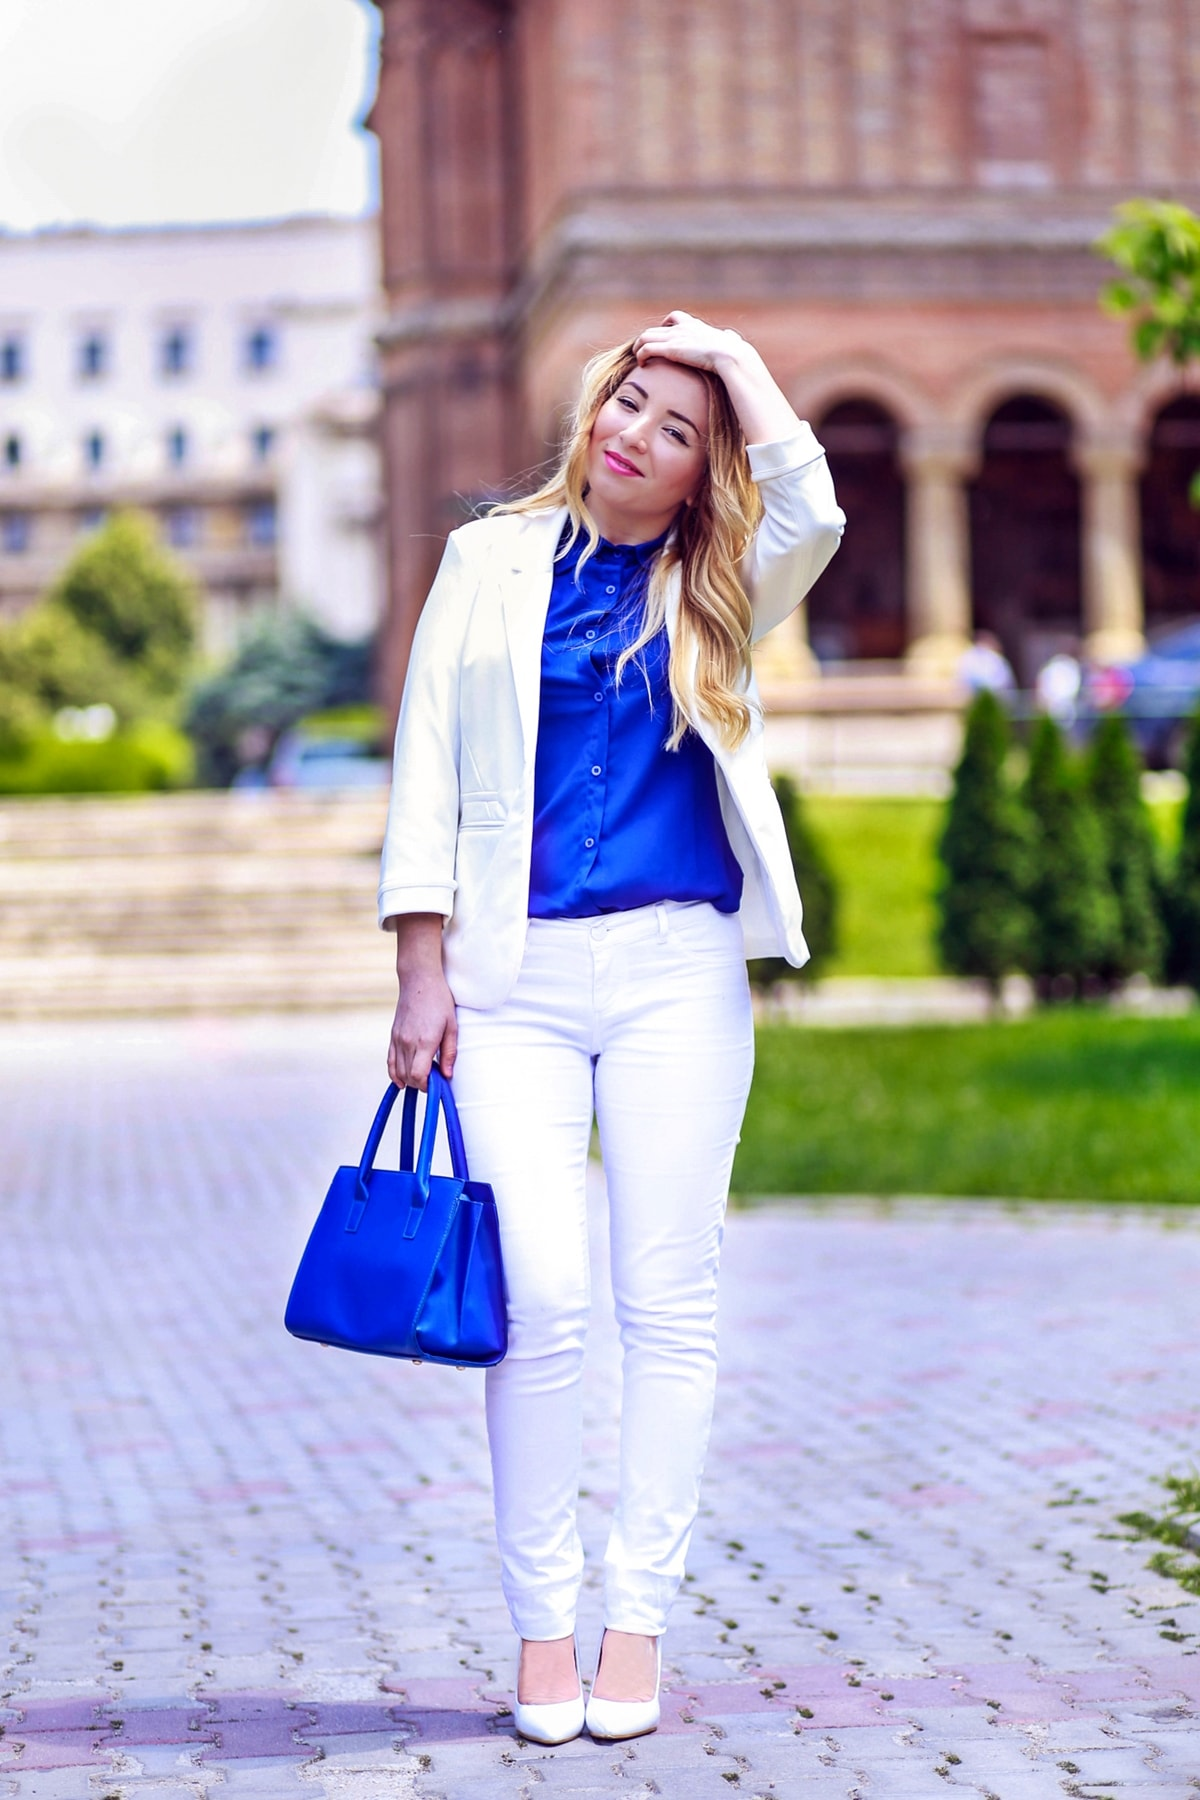 andreea ristea - cum purtam alb si albastru, idei de tinute, tinuta office, geanta albastra, pantaloni albi, sacoul alb